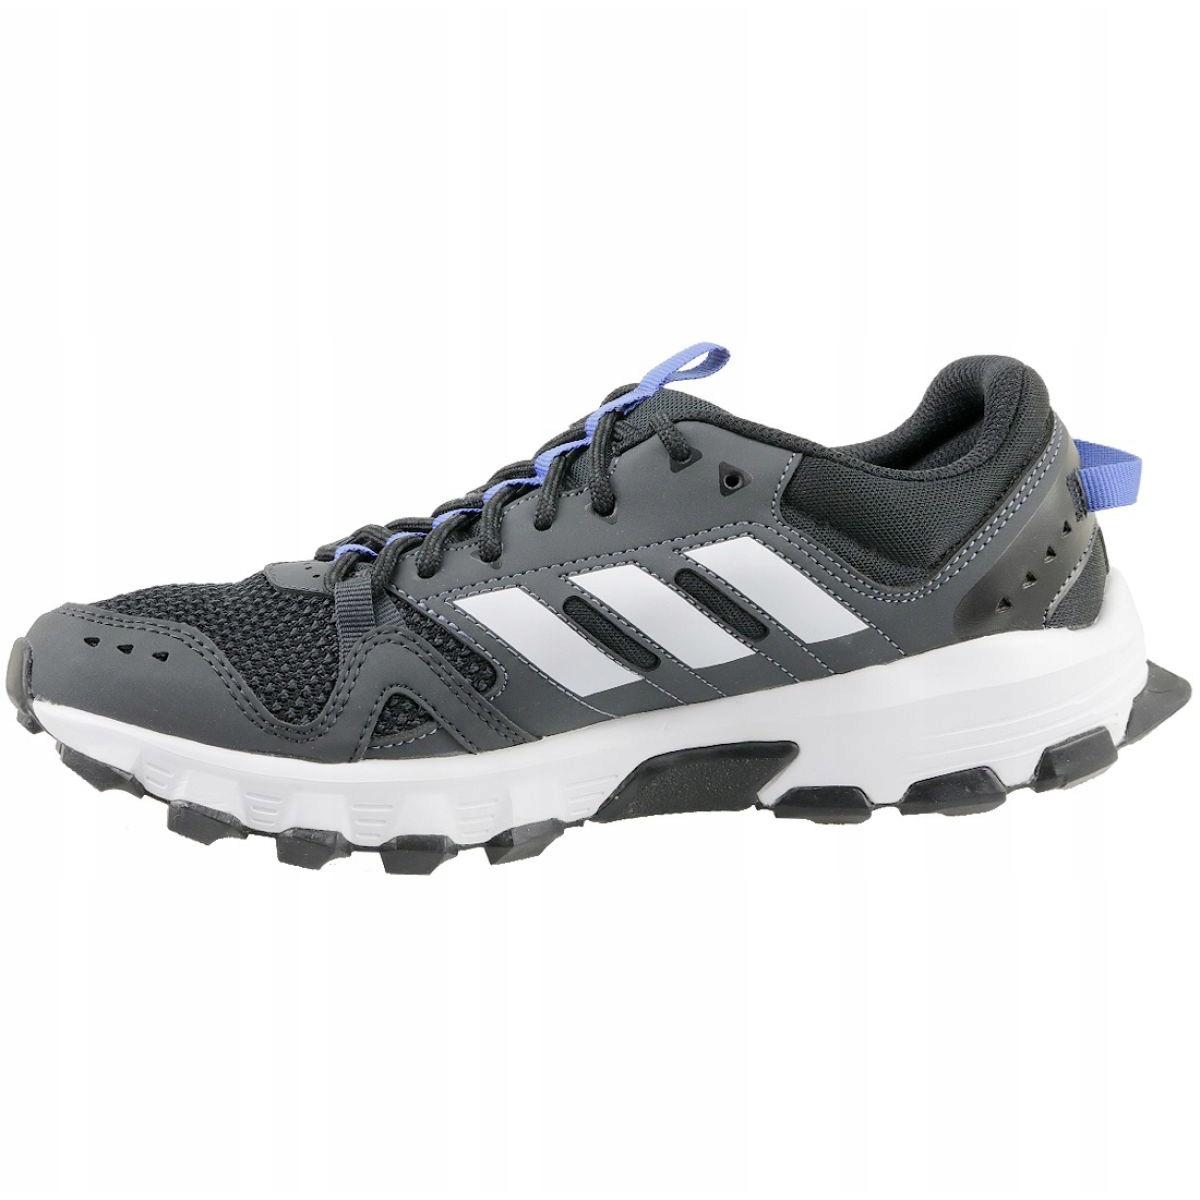 Adidas Rockadia Trail M